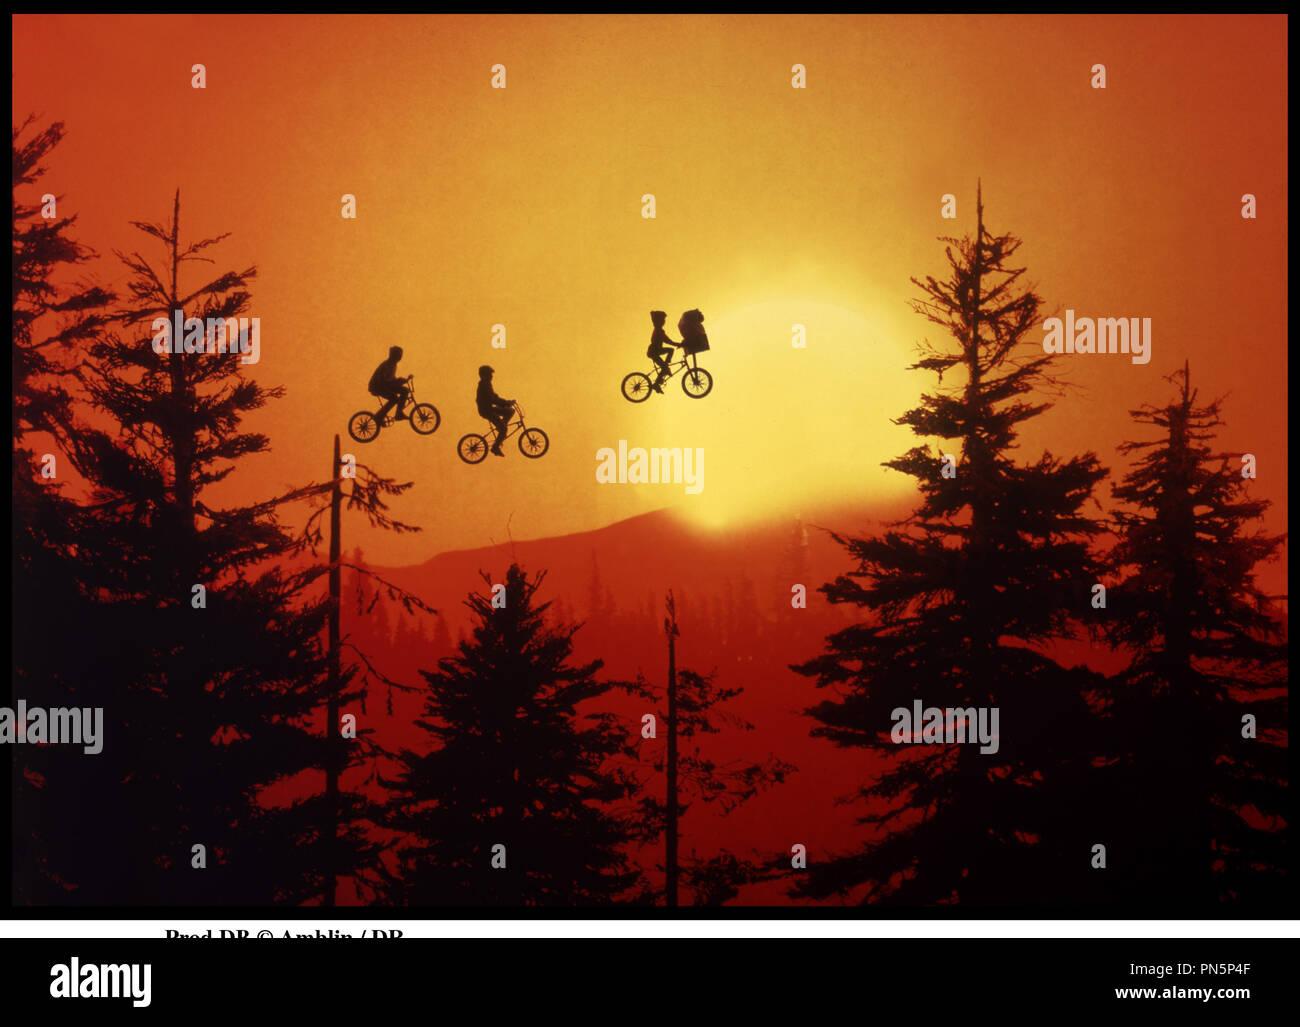 Prod DB © Amblin / DR E.T (E.T L'extra-terrestre) de Steven Spielberg 1982 USA avec Henry Thomas, extra-terrestre lune, velo, voyage, diriger autour Photo Stock